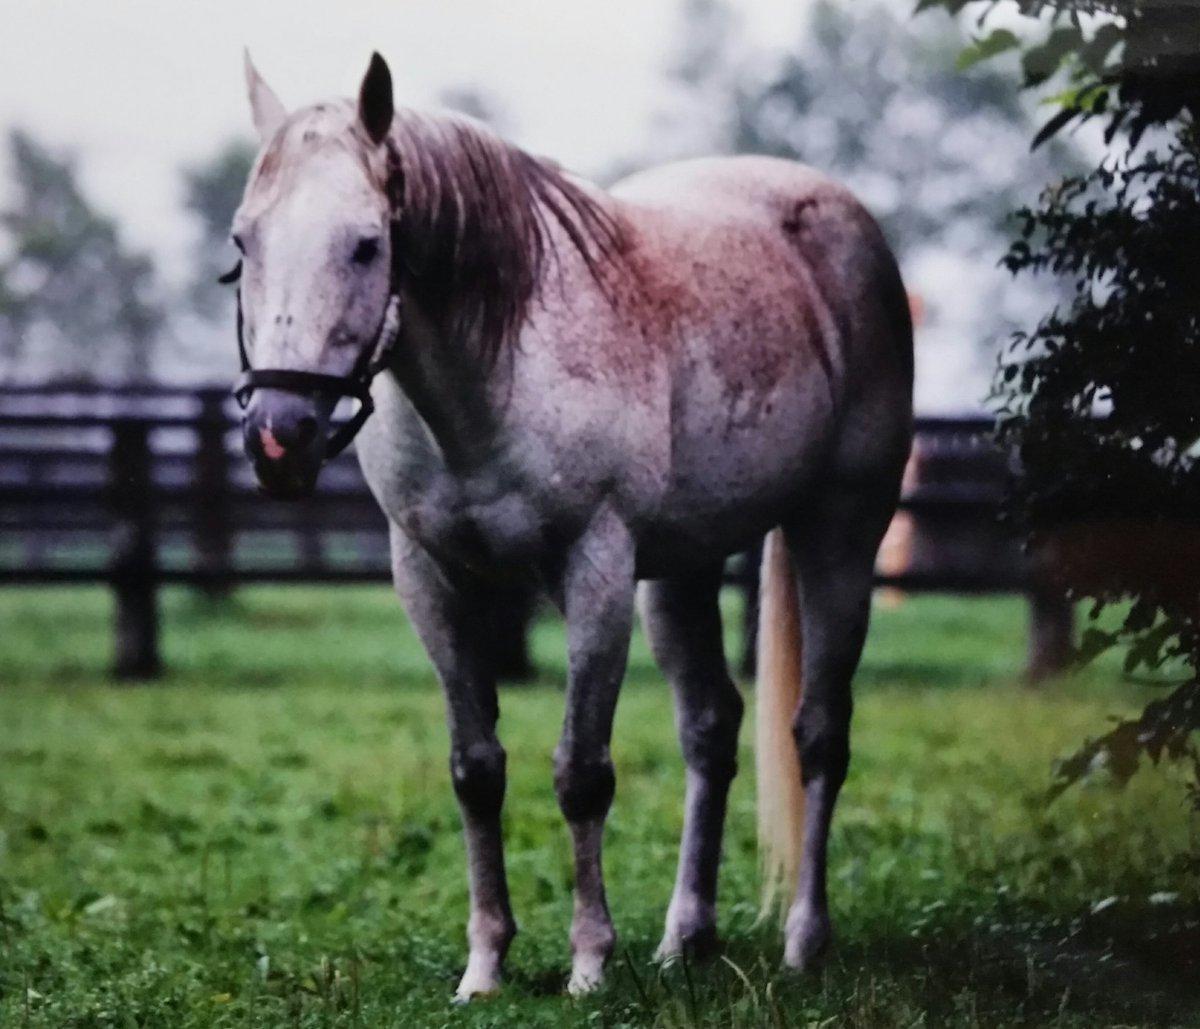 RT @bubblegumrobroy: 89年 第56代ダービー馬✨ ウィナーズサークル 皐月賞2着に好走しての参戦で中団前目からしぶとく脚を伸ばし芦毛馬初のダービー馬に🐎💨 しかも芝の初勝利がダービー #ダービー #東京優駿 https://t.co/z8vveP0mfk